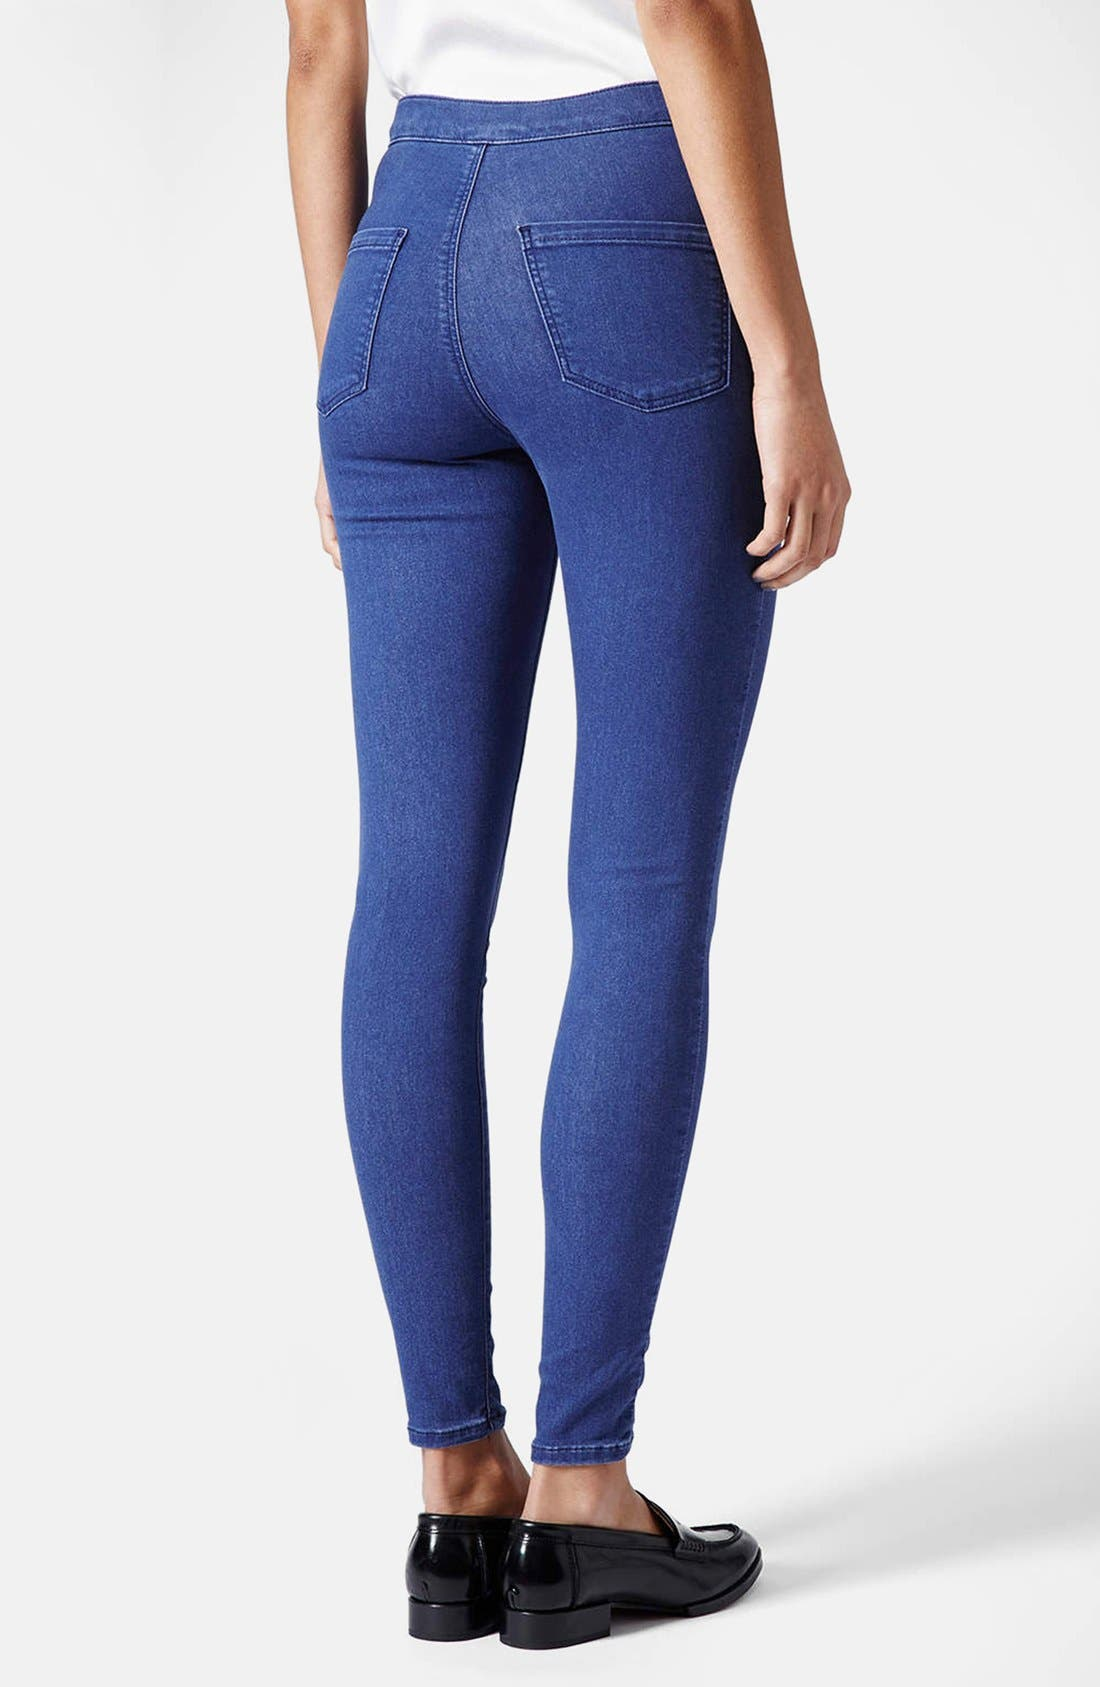 Alternate Image 2  - Topshop Moto 'Joni' High Rise Skinny Jeans (Regular, Short & Long) (Blue)